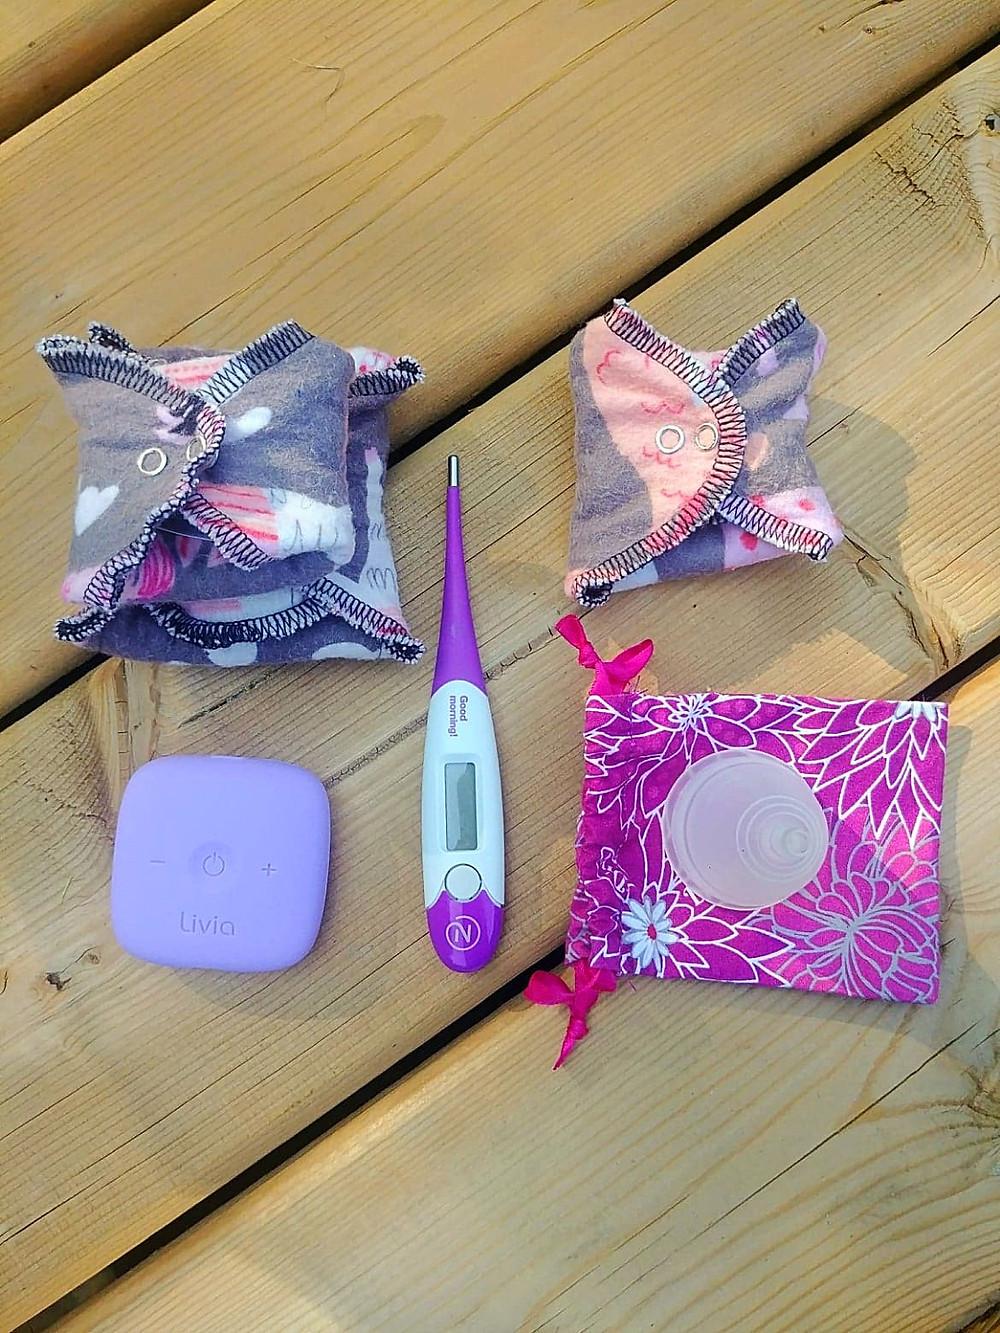 Female travel essentials including Livia, Natural Cycles birth control